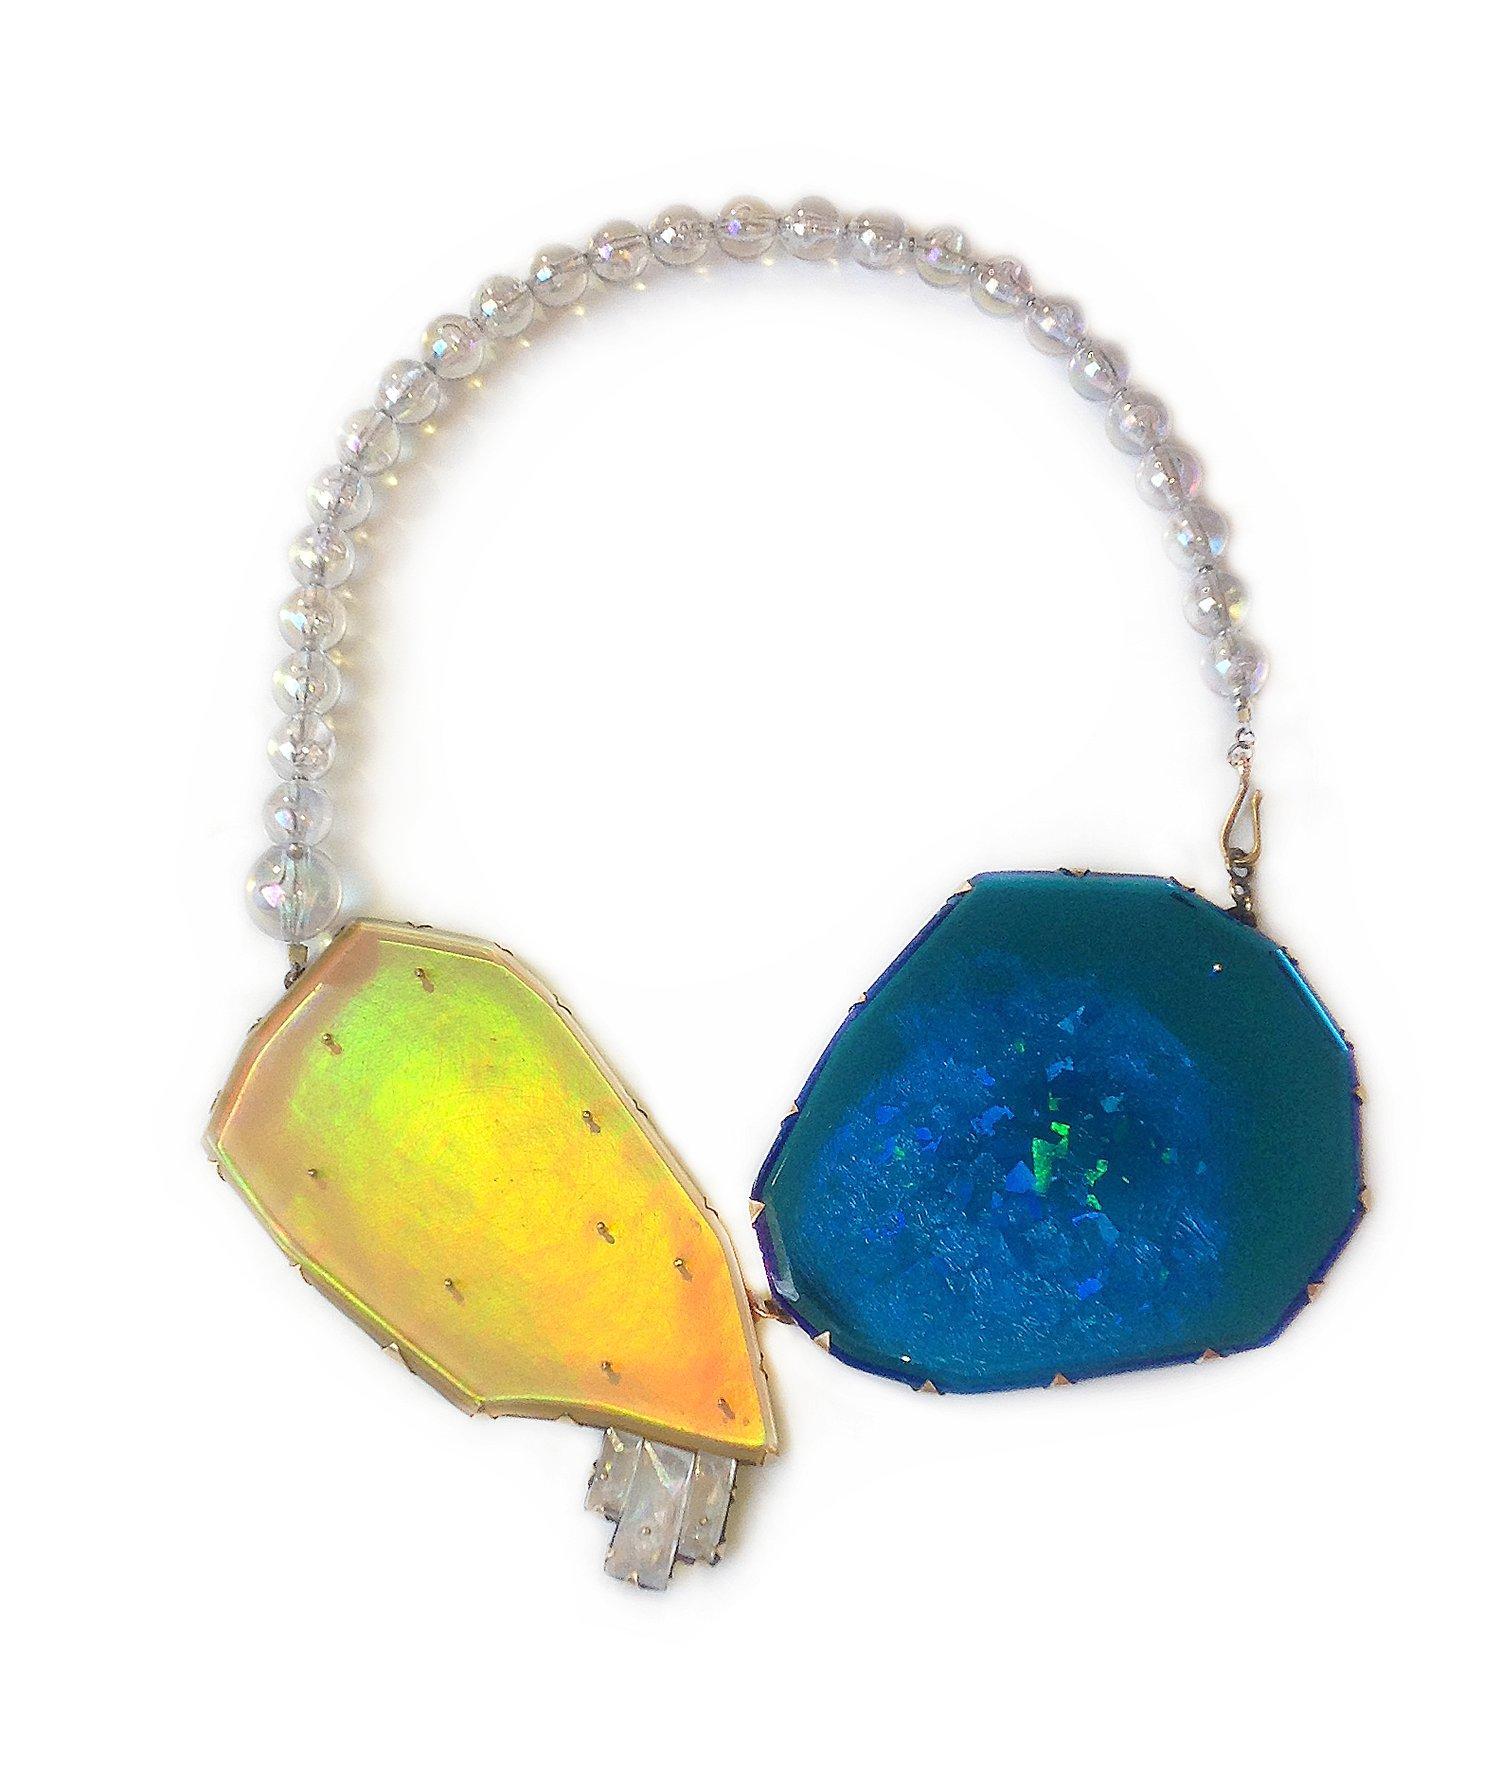 Image of Nikki Couppee Hologem Sapphire Necklace